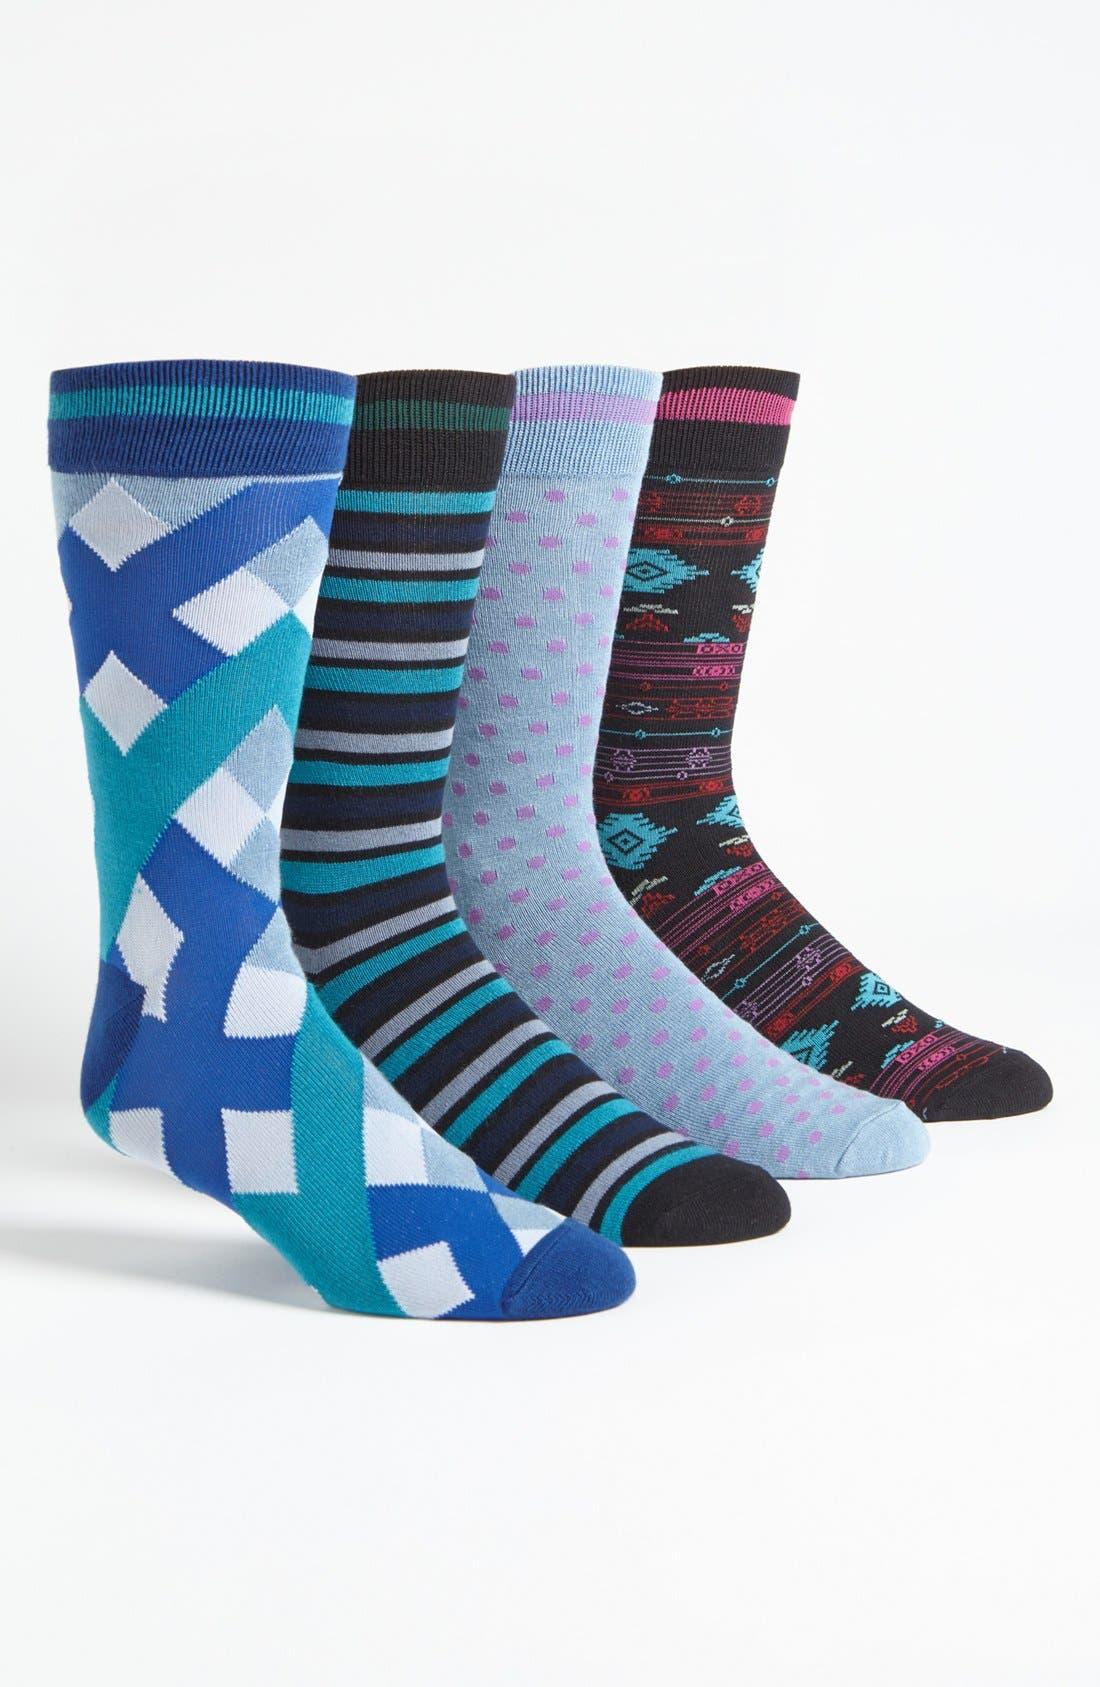 Alternate Image 1 Selected - Basic Sock 'Bottoms Out' Pattern Socks (4-Pack)